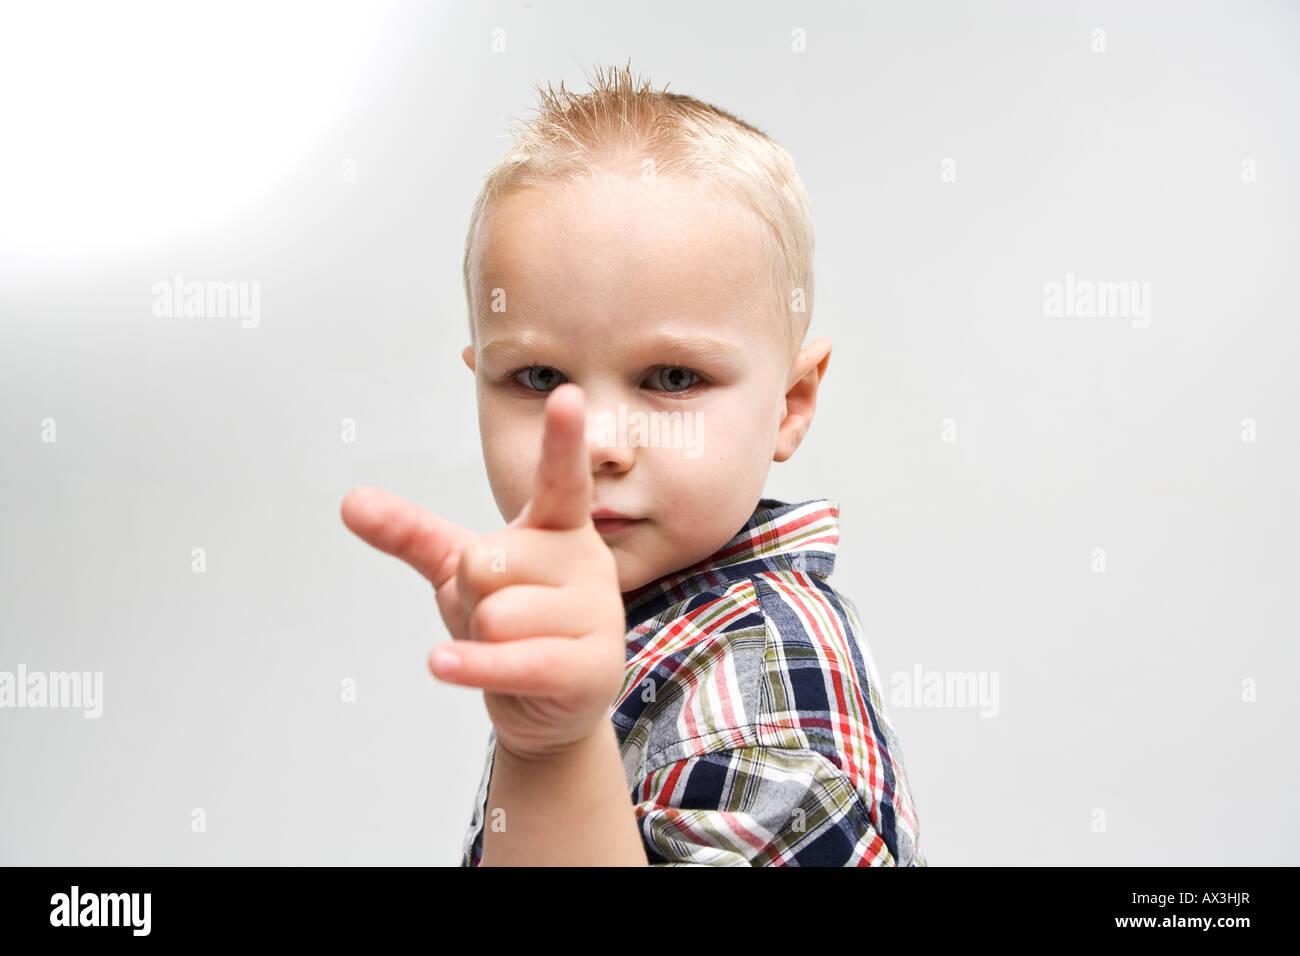 Luka dedo señalador en viewer Imagen De Stock